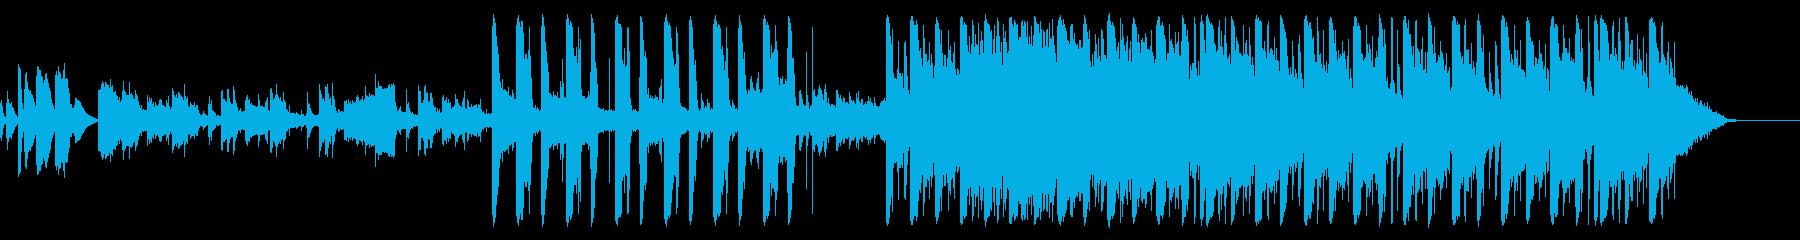 Sound FX、129 BPMの再生済みの波形